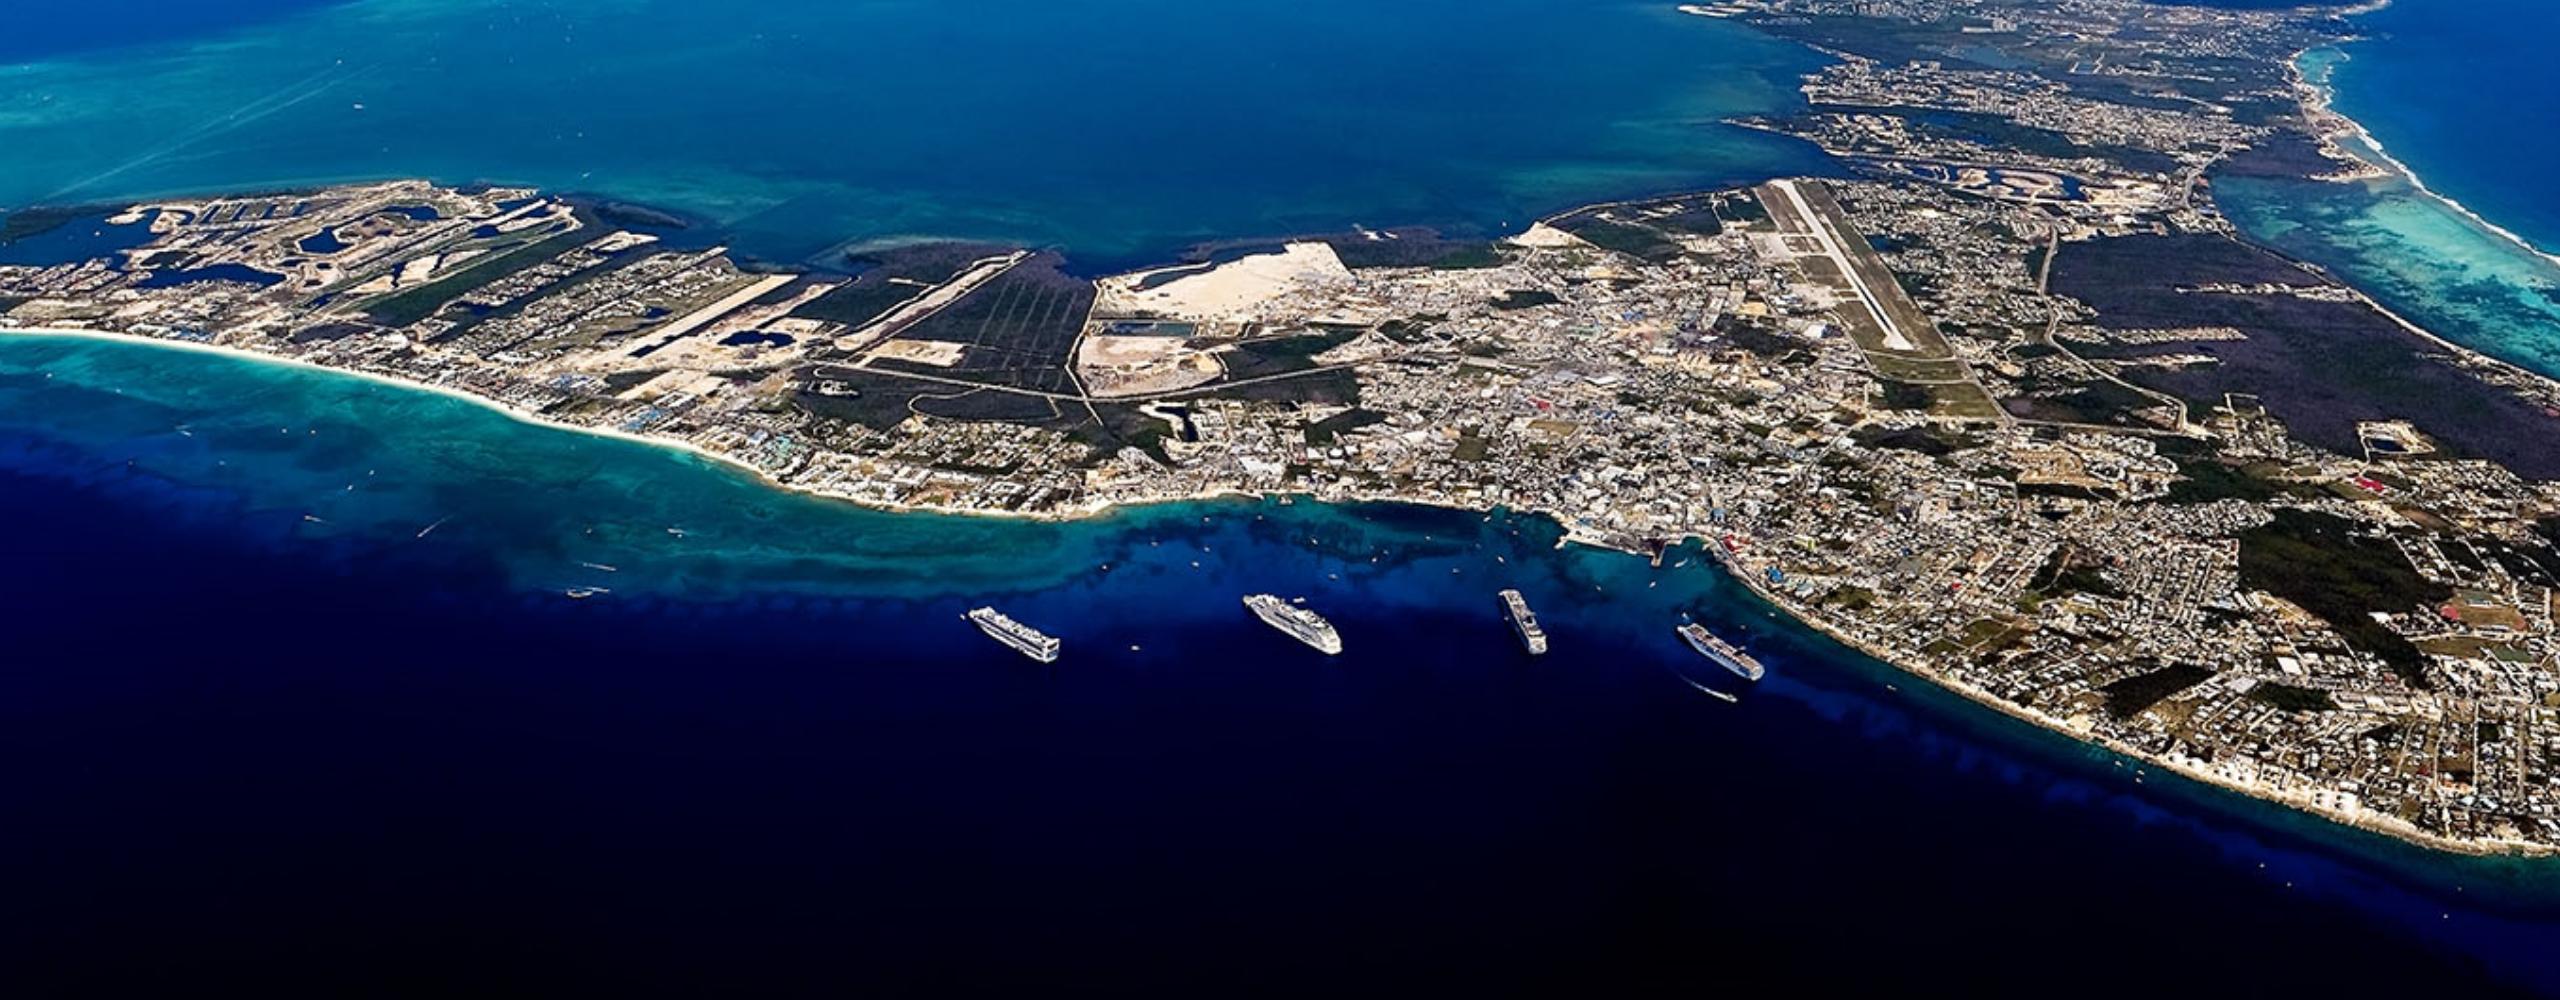 Cayman Islands Introduces VASP Regime in Preparation for Virtual Asset Business